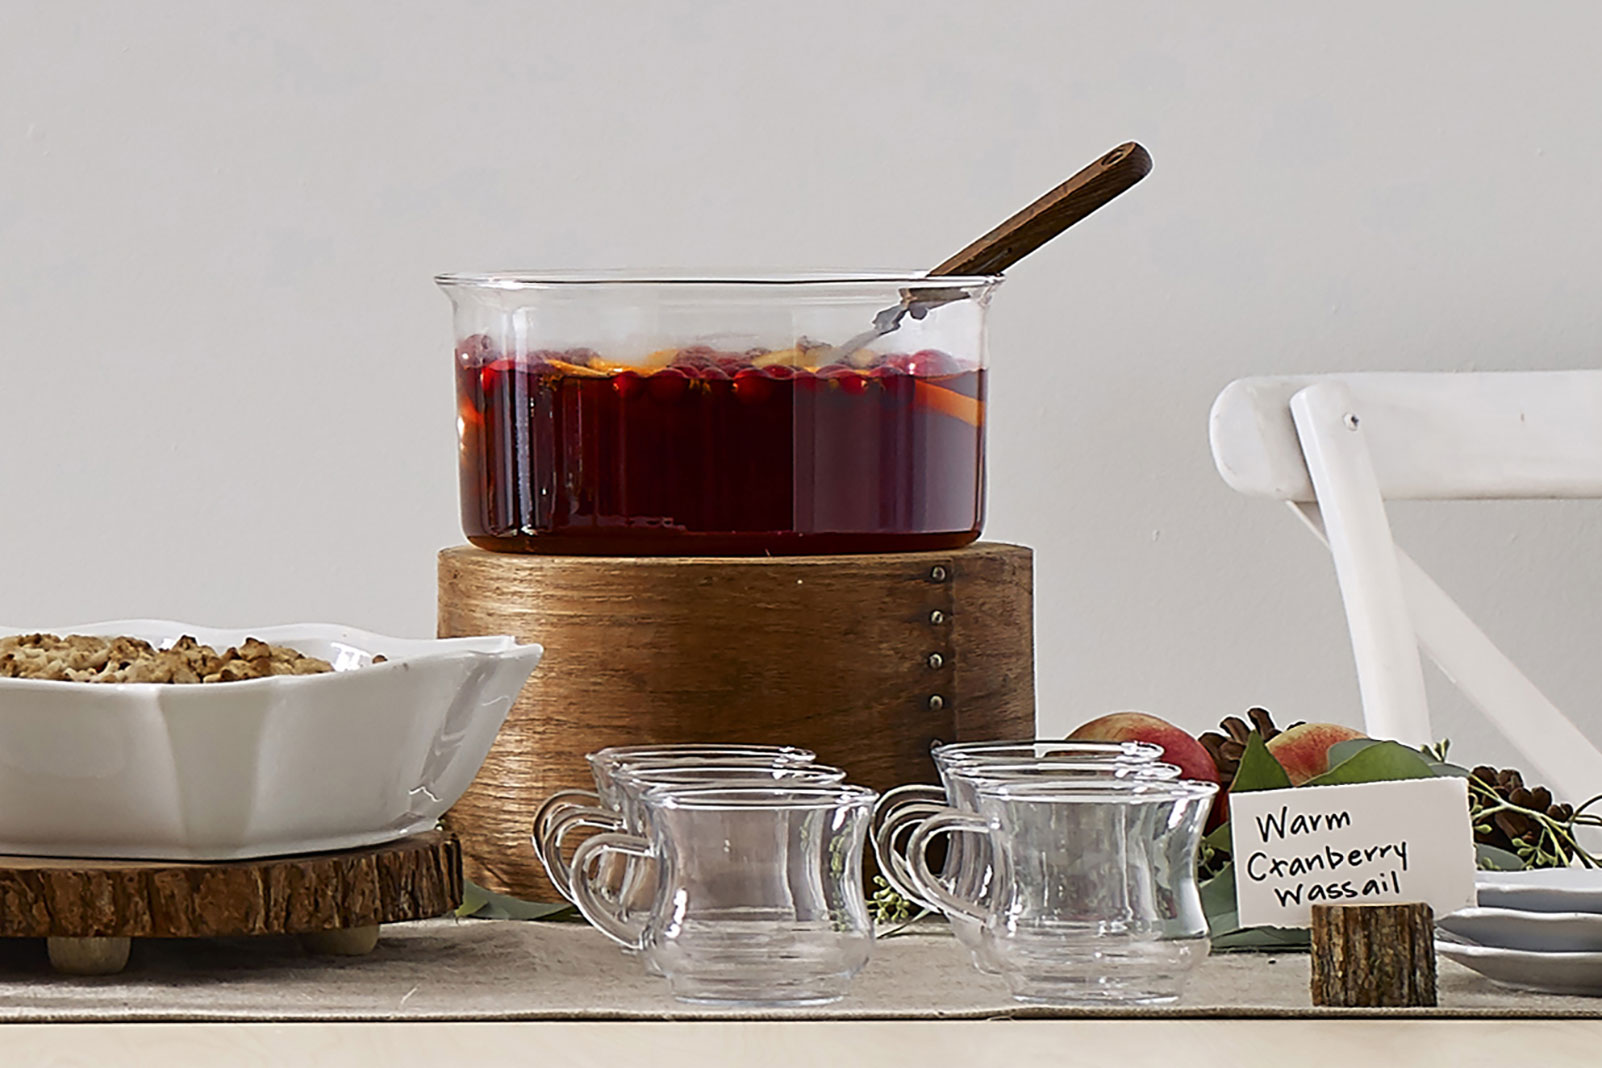 Warm Cranberry Wassail